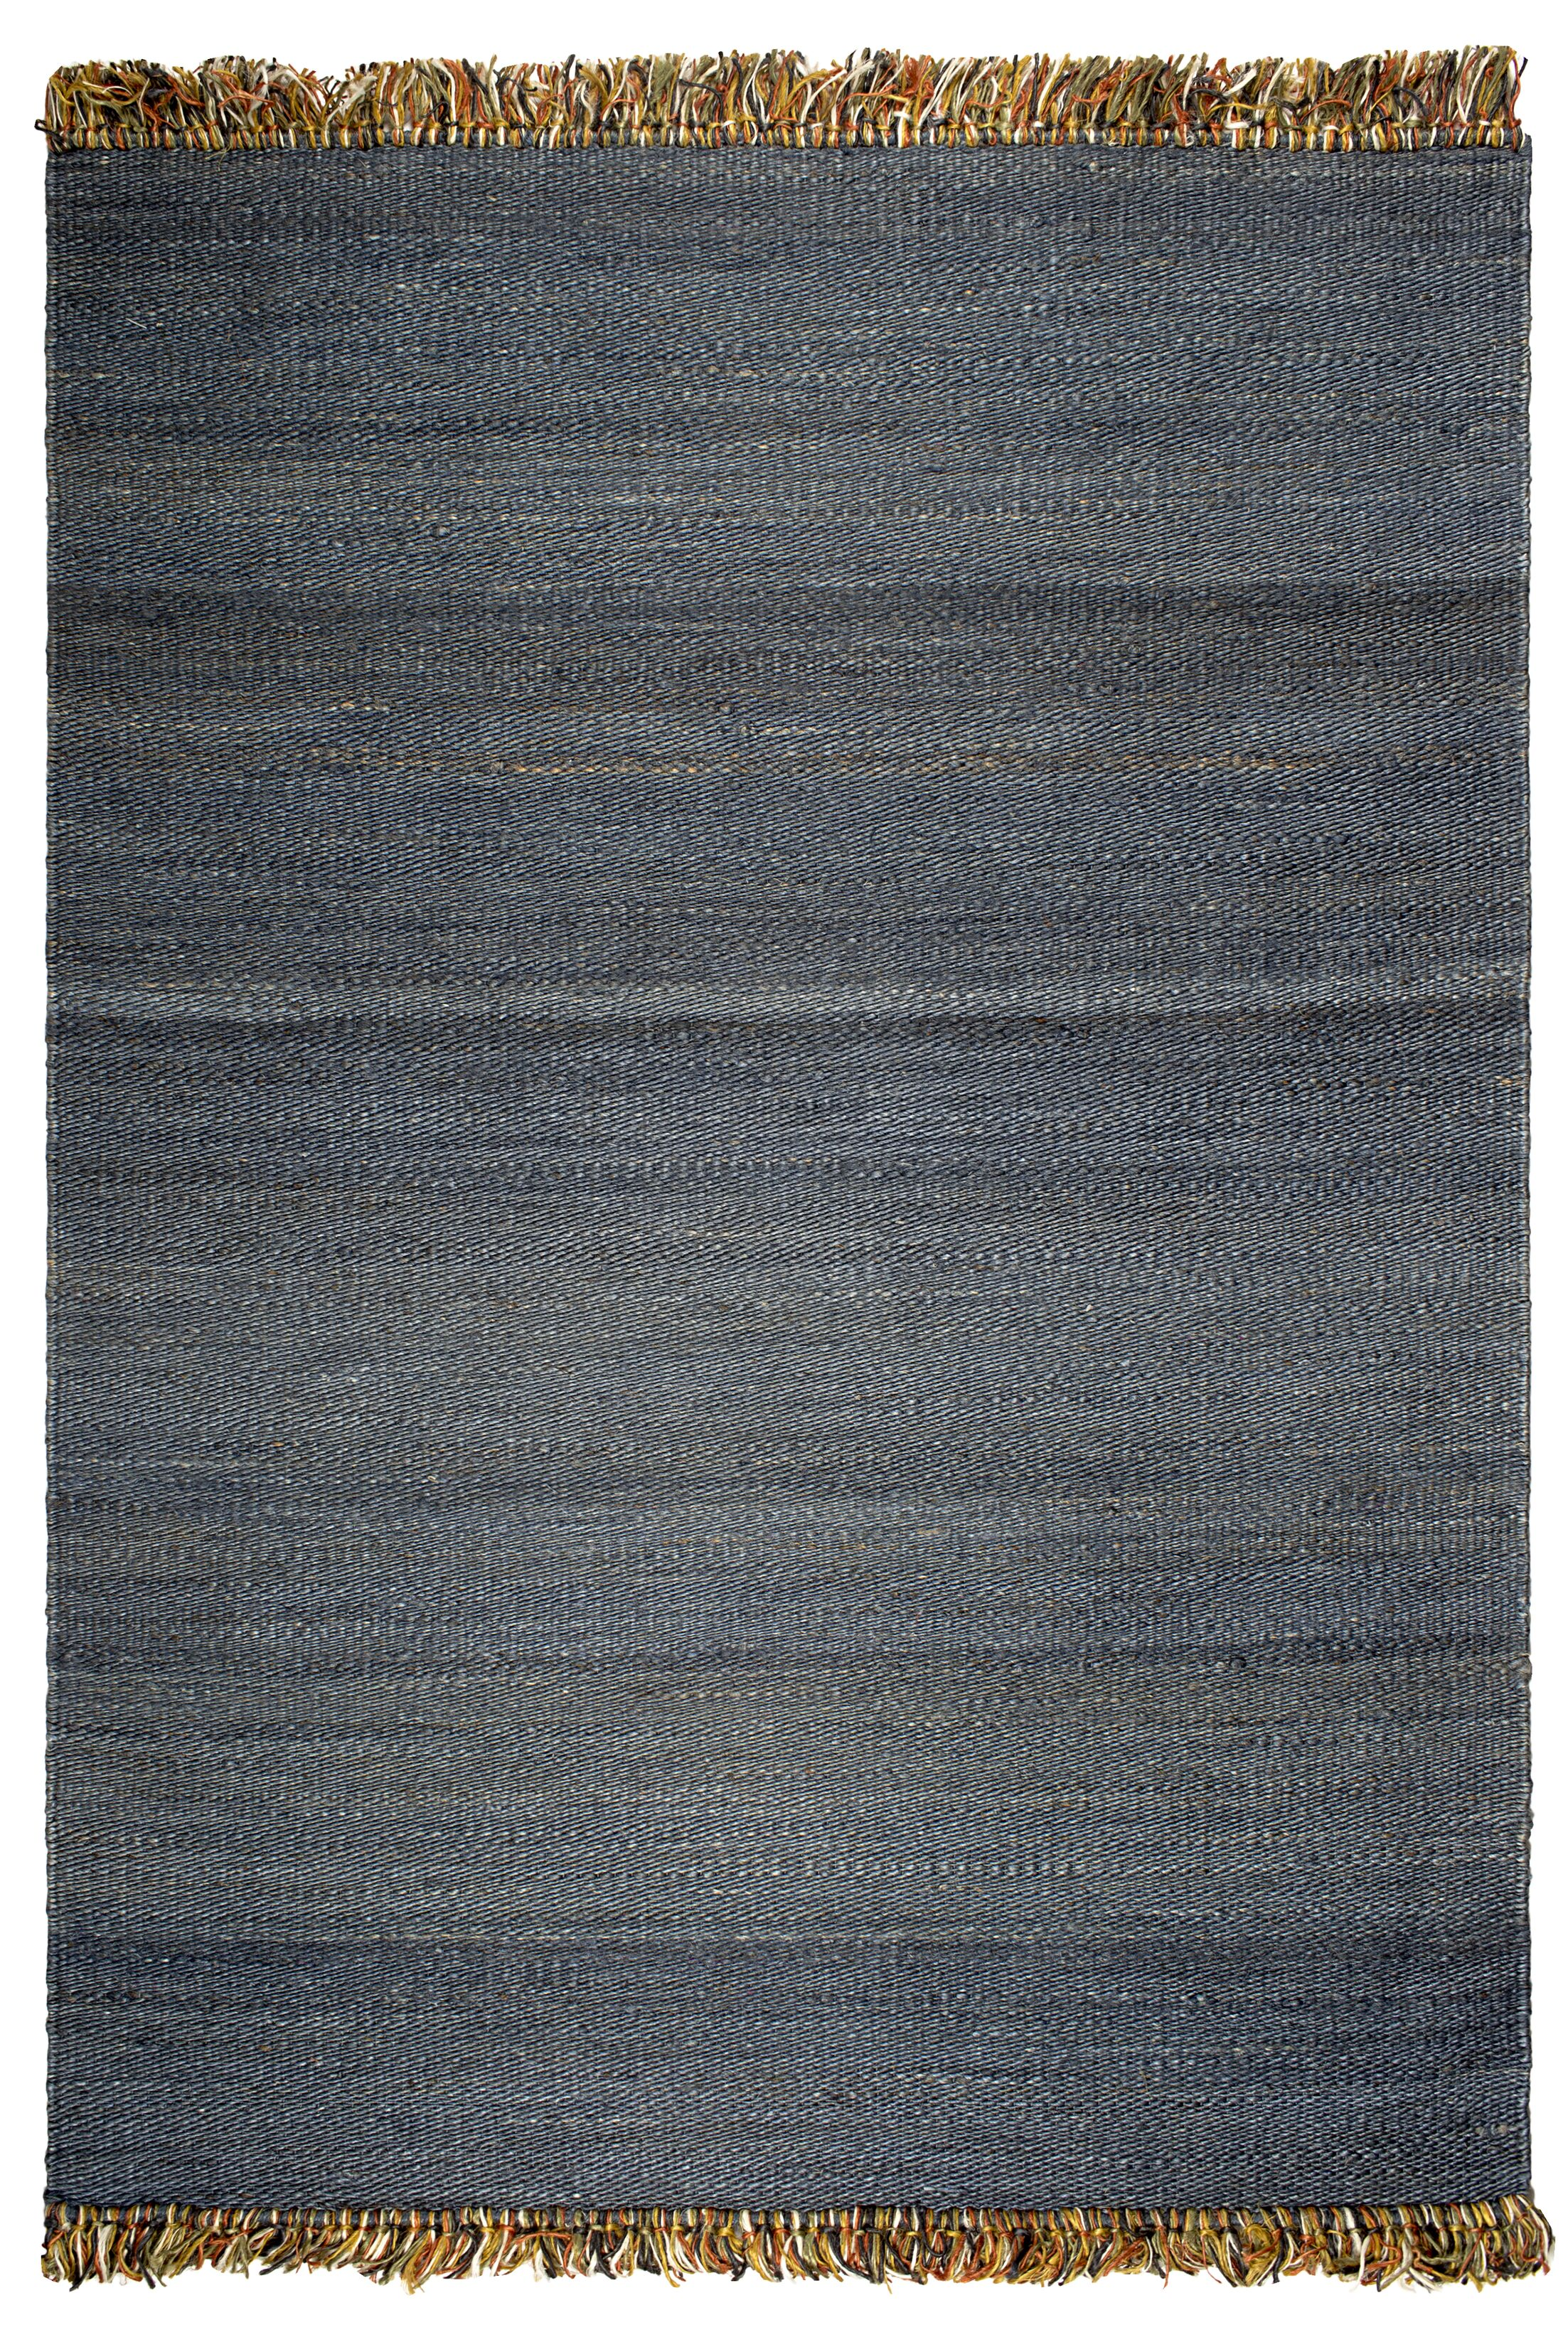 West Side Saguaro Hand-Woven Blue Area Rug Rug Size: 6' x 9'